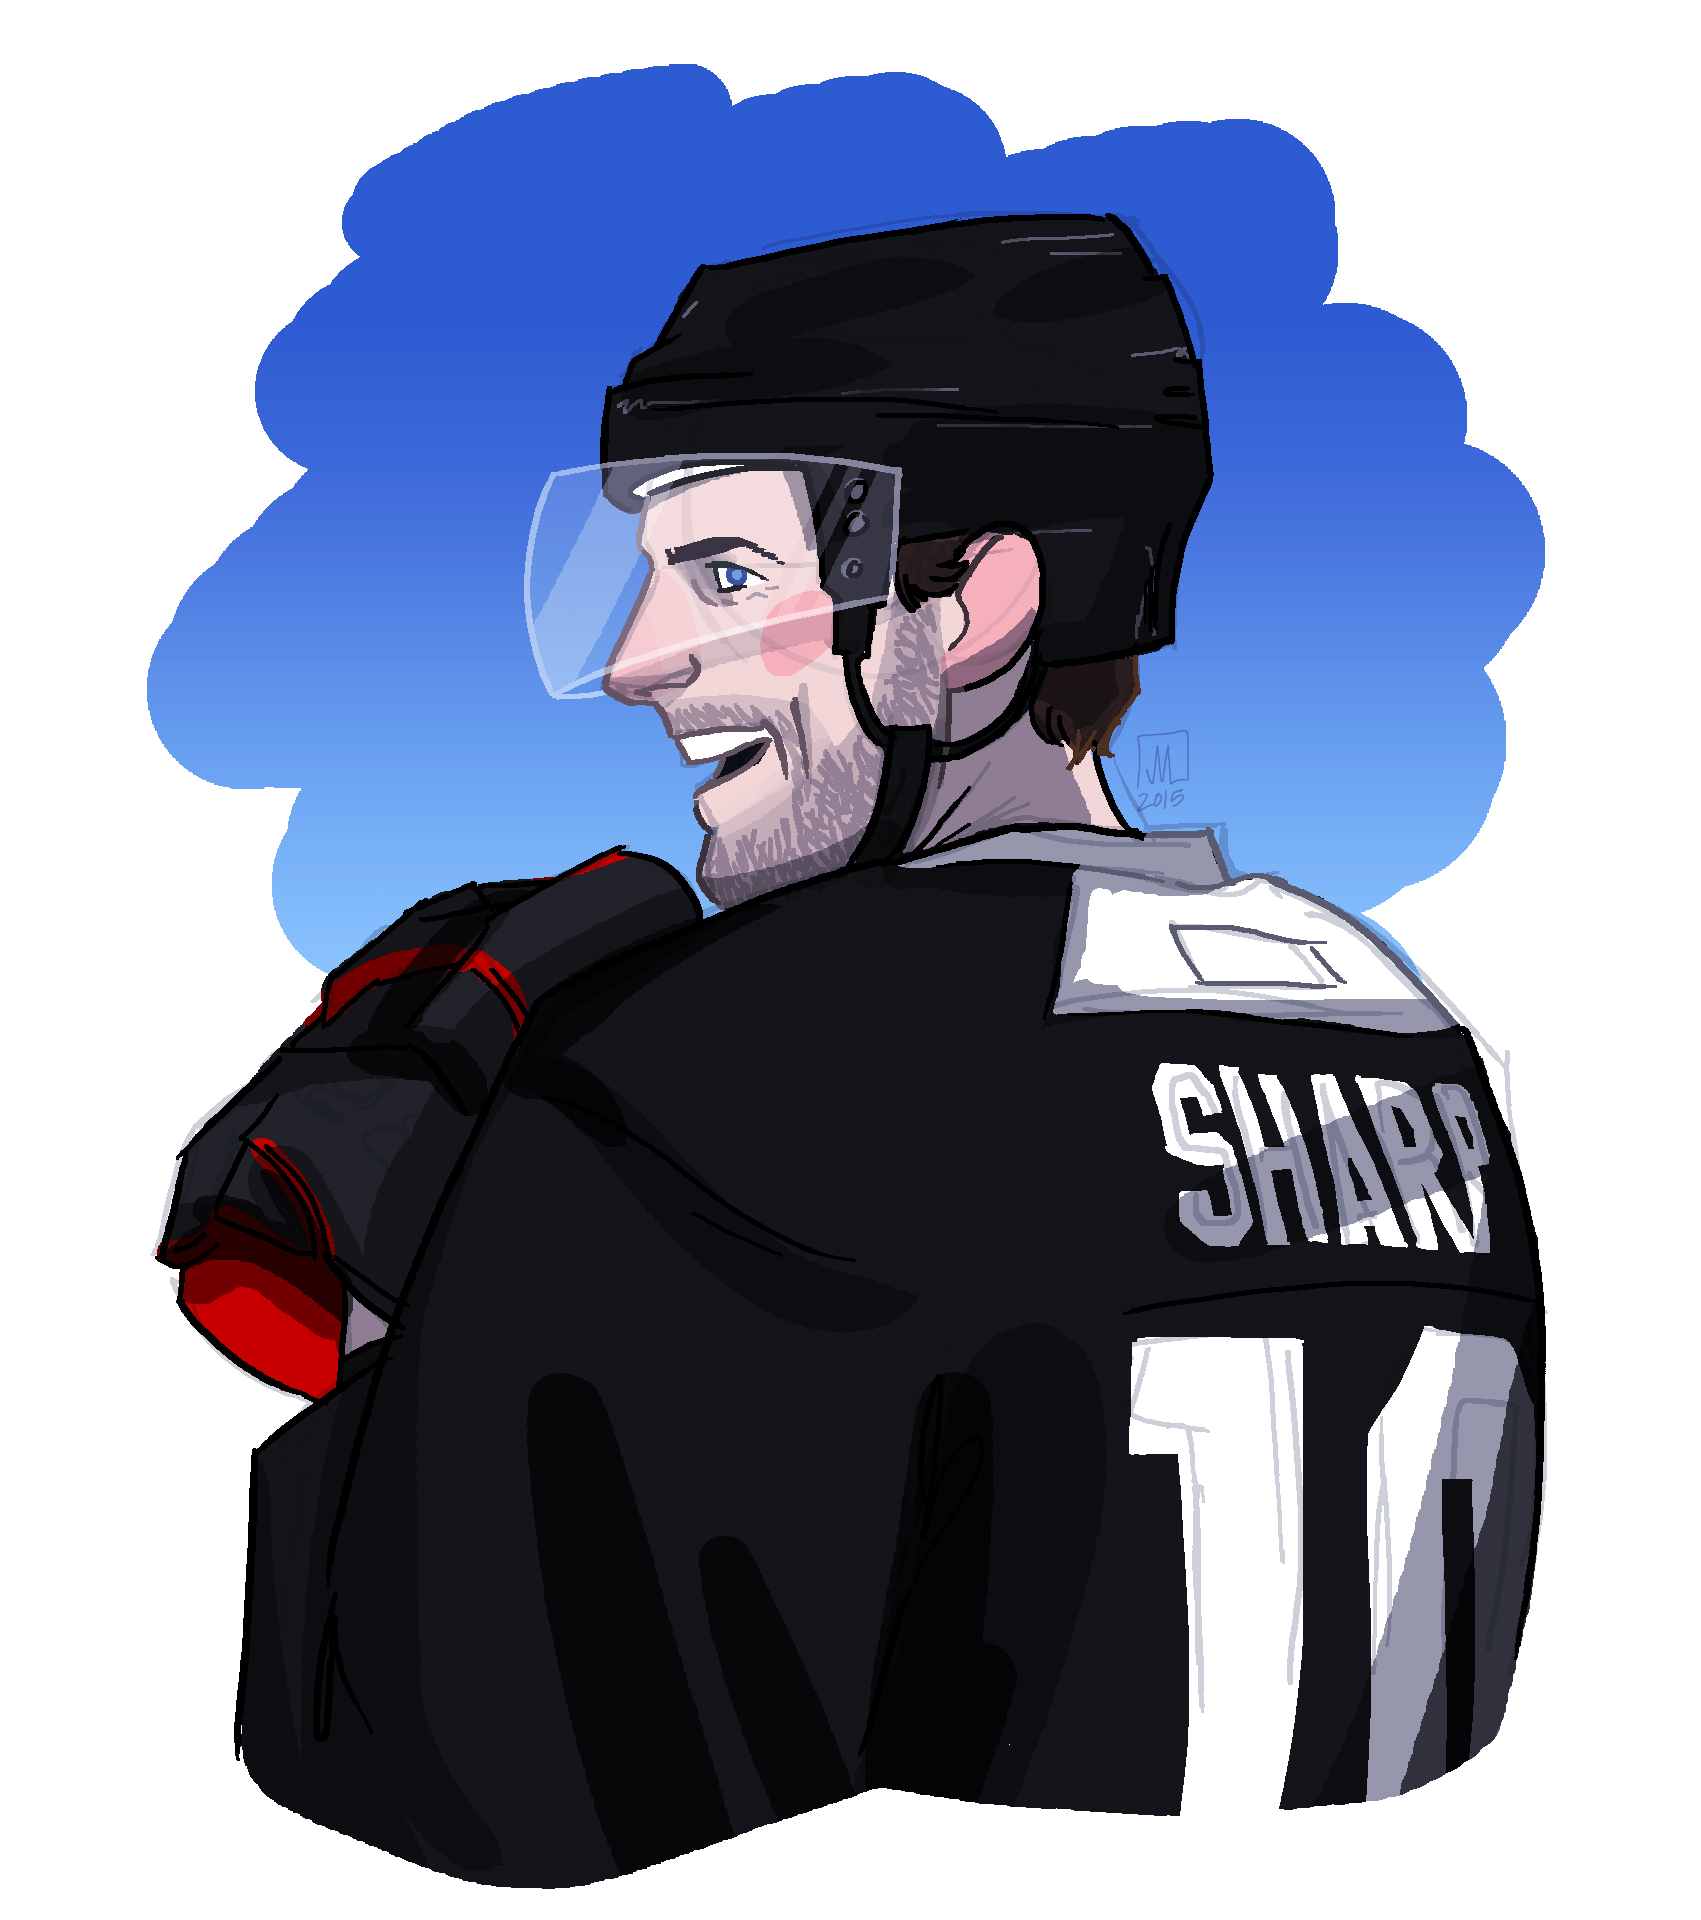 Patrick Sharp